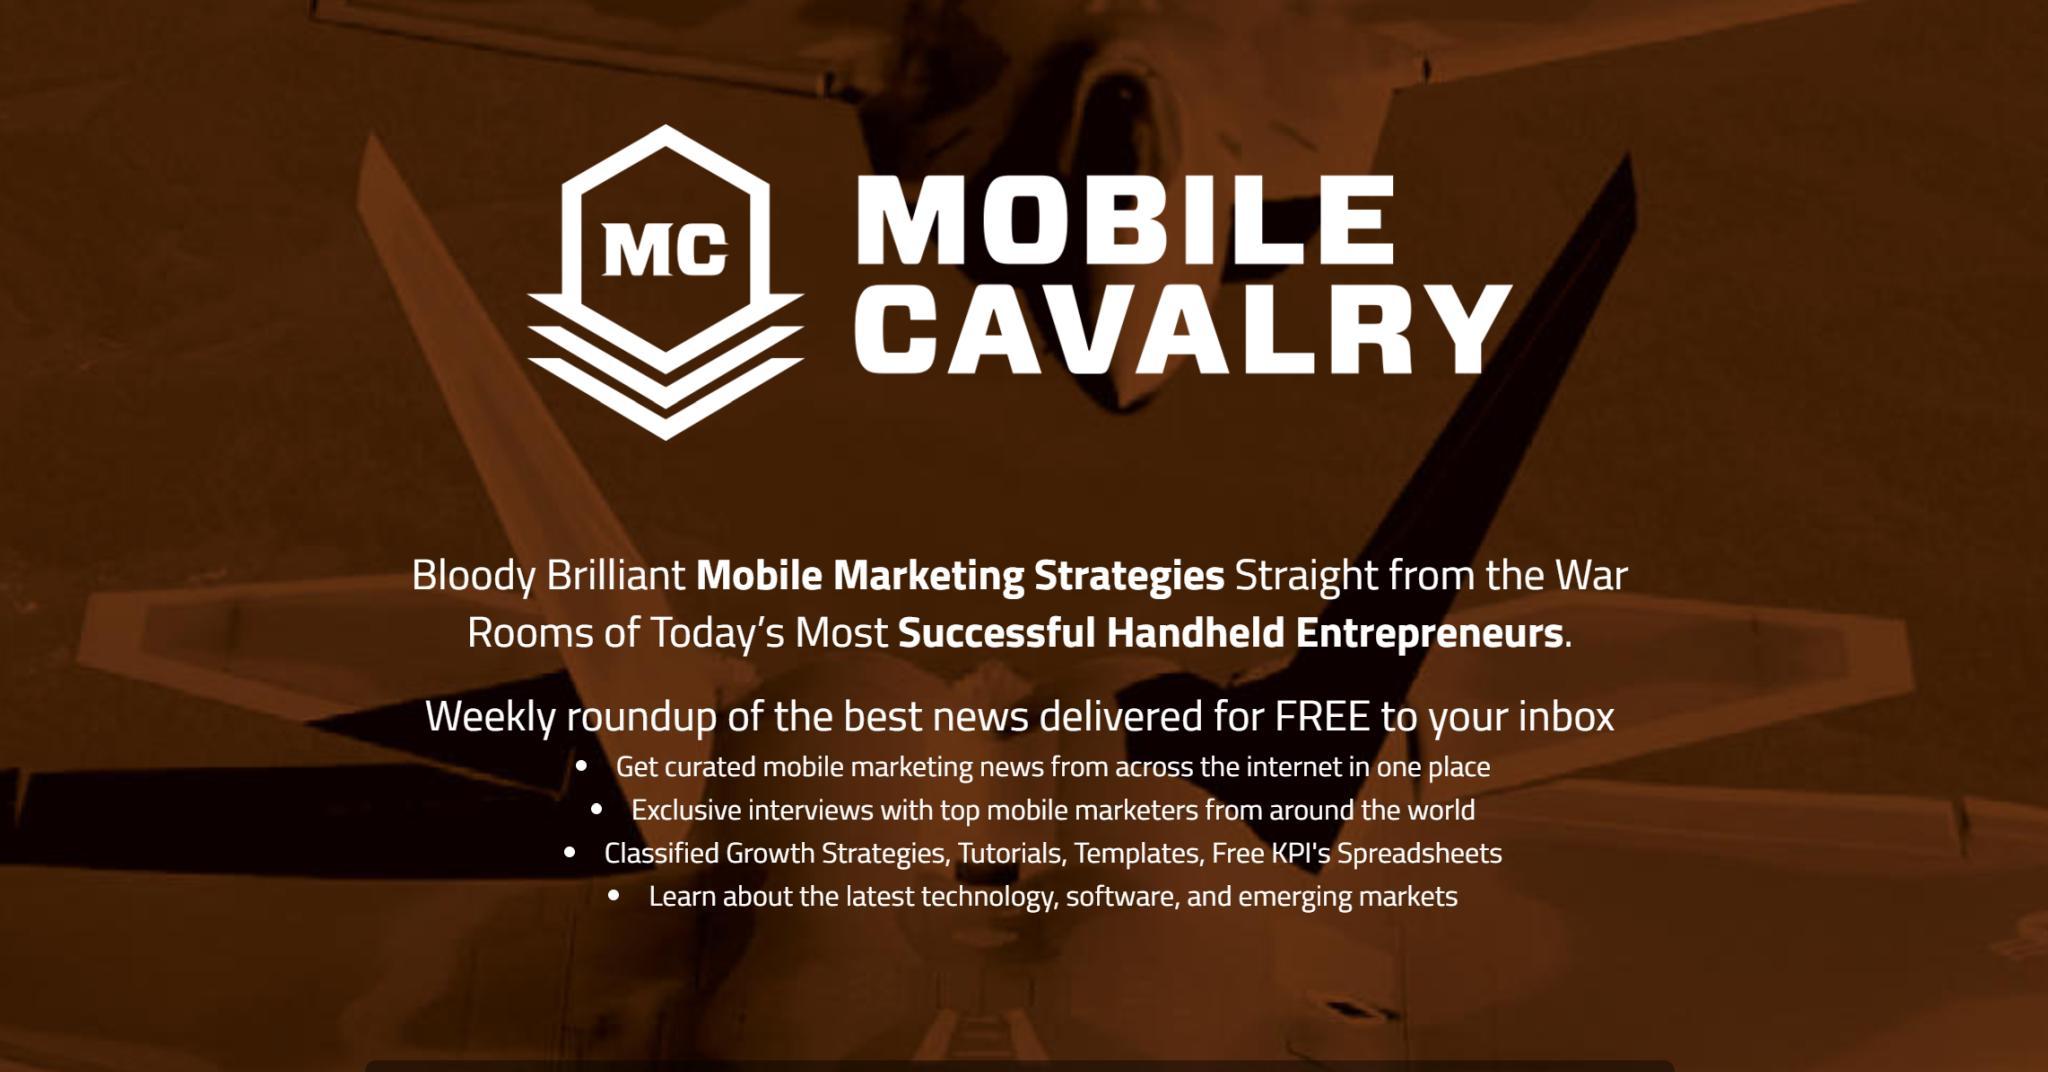 Mobile Cavalry